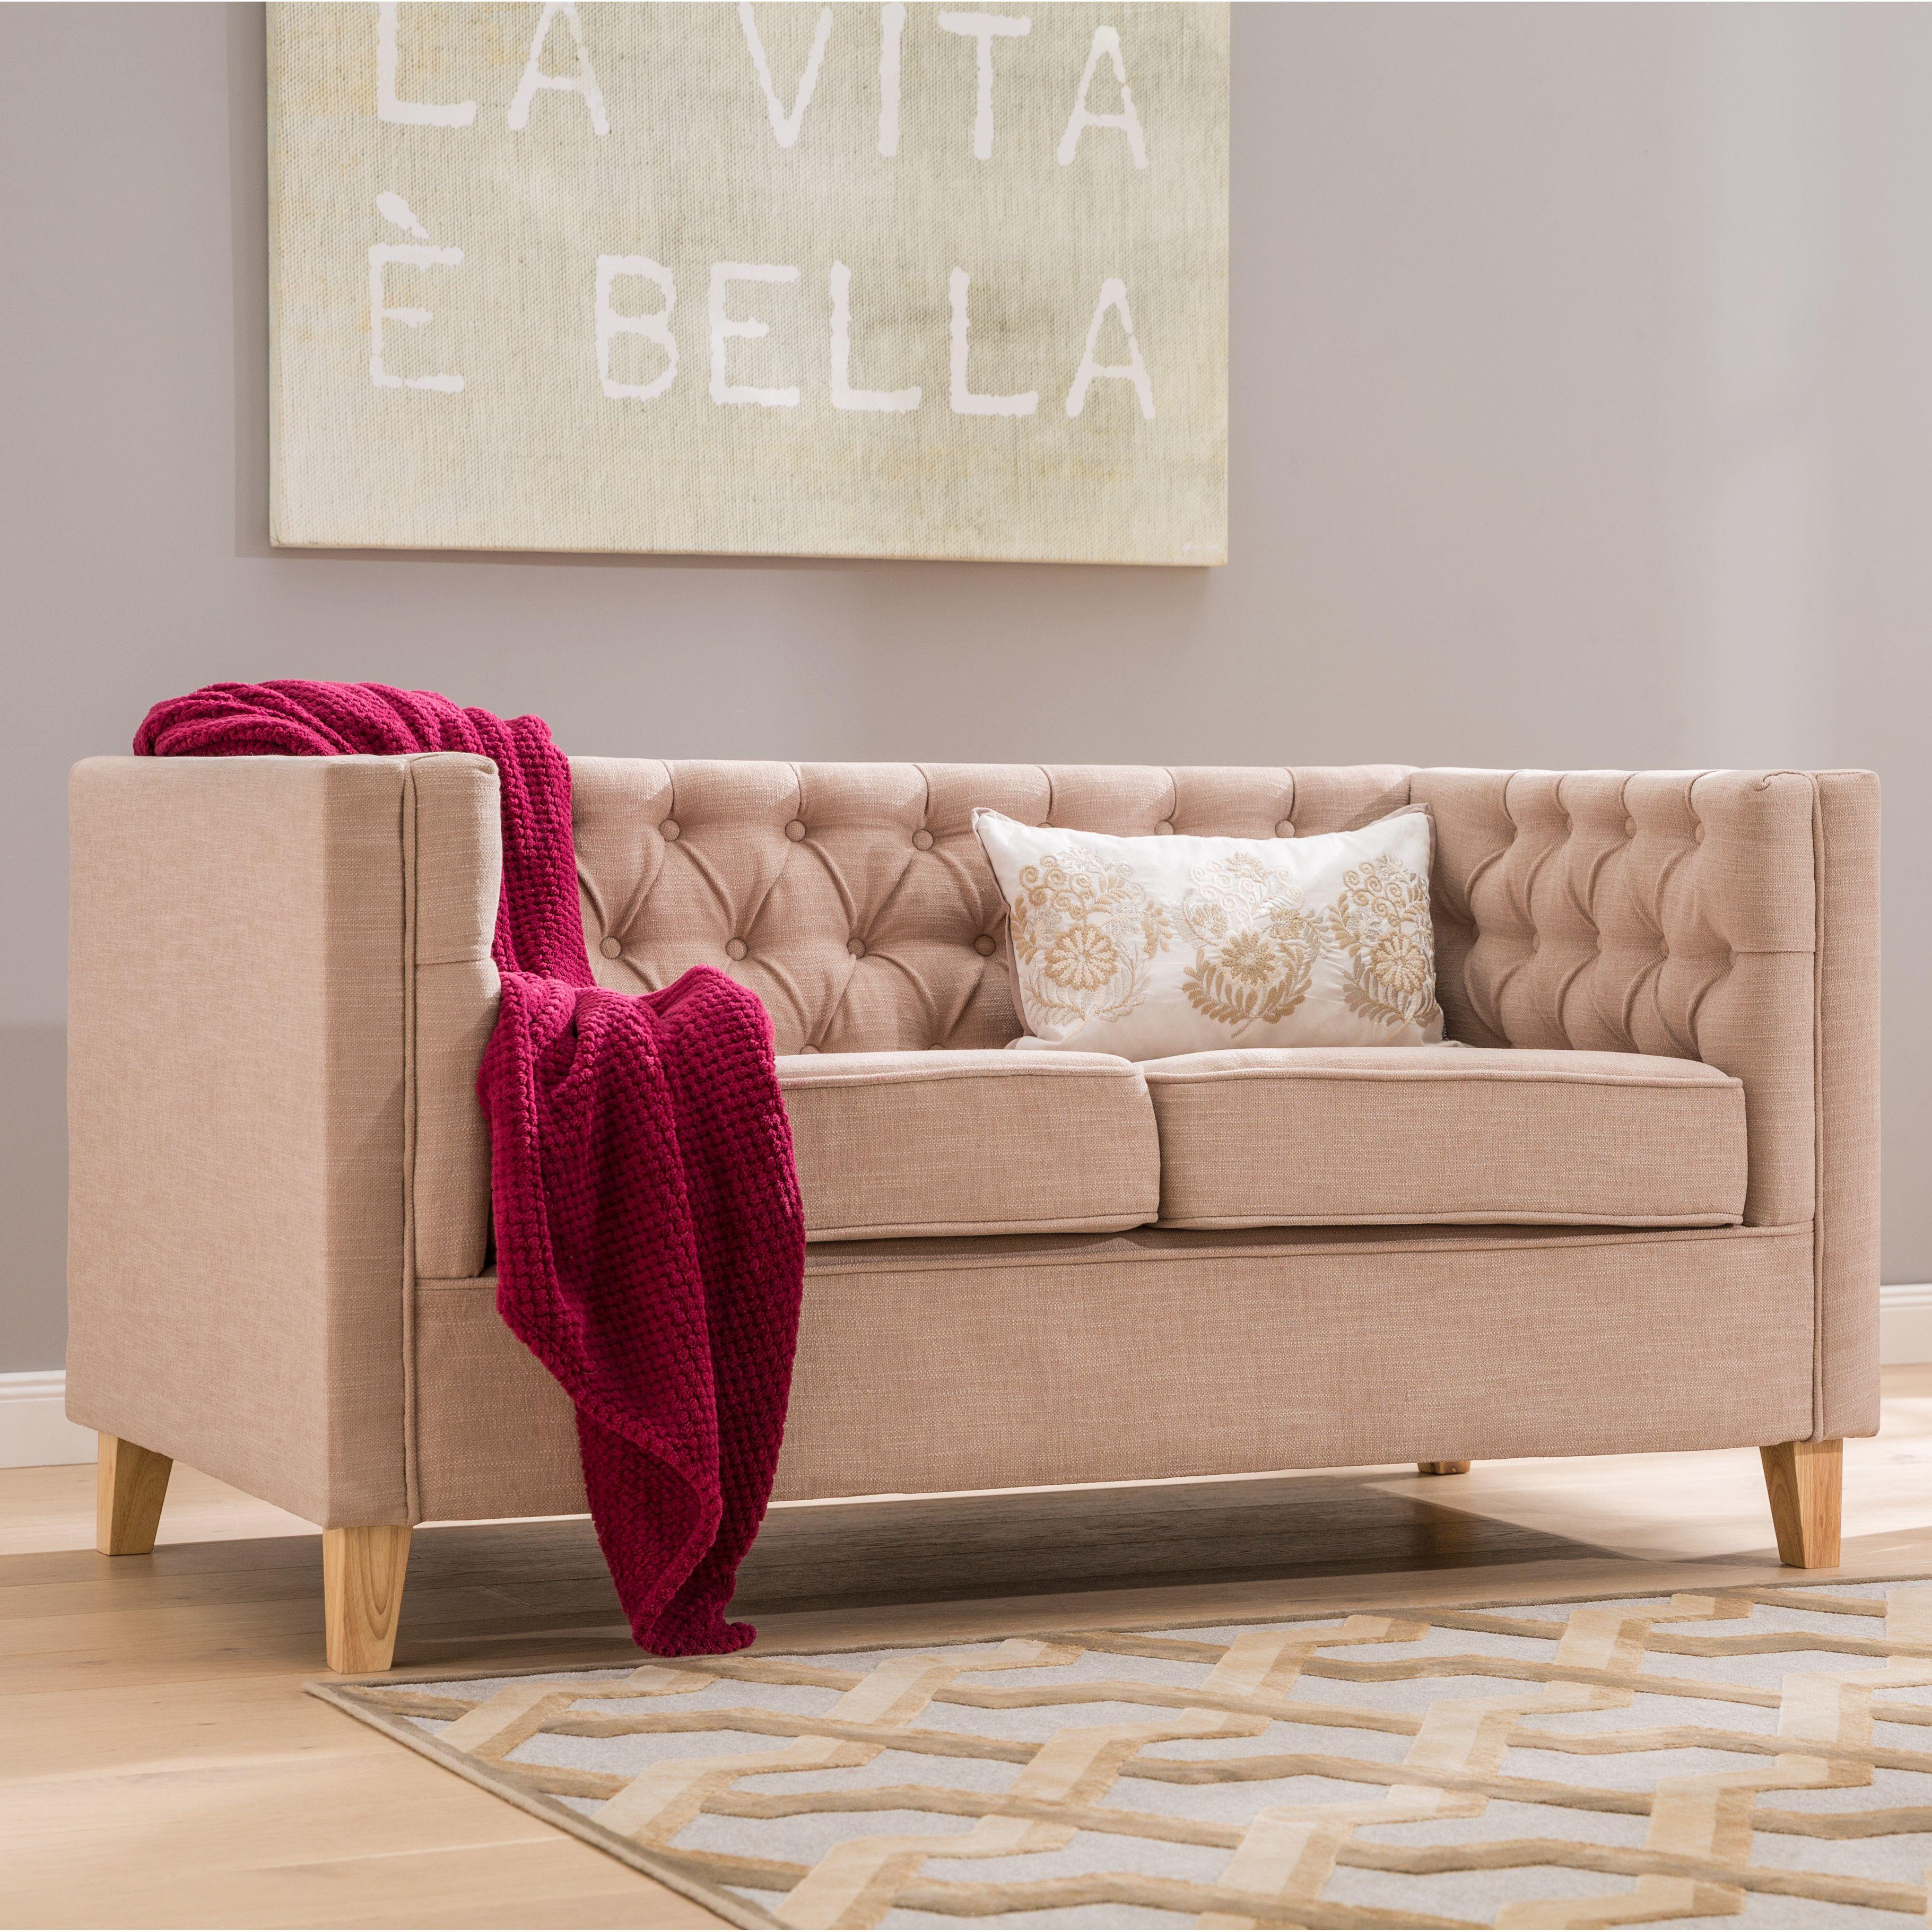 Loughborough Loveseat | Love Seat, Couch Furniture, 2 Seater Sofa